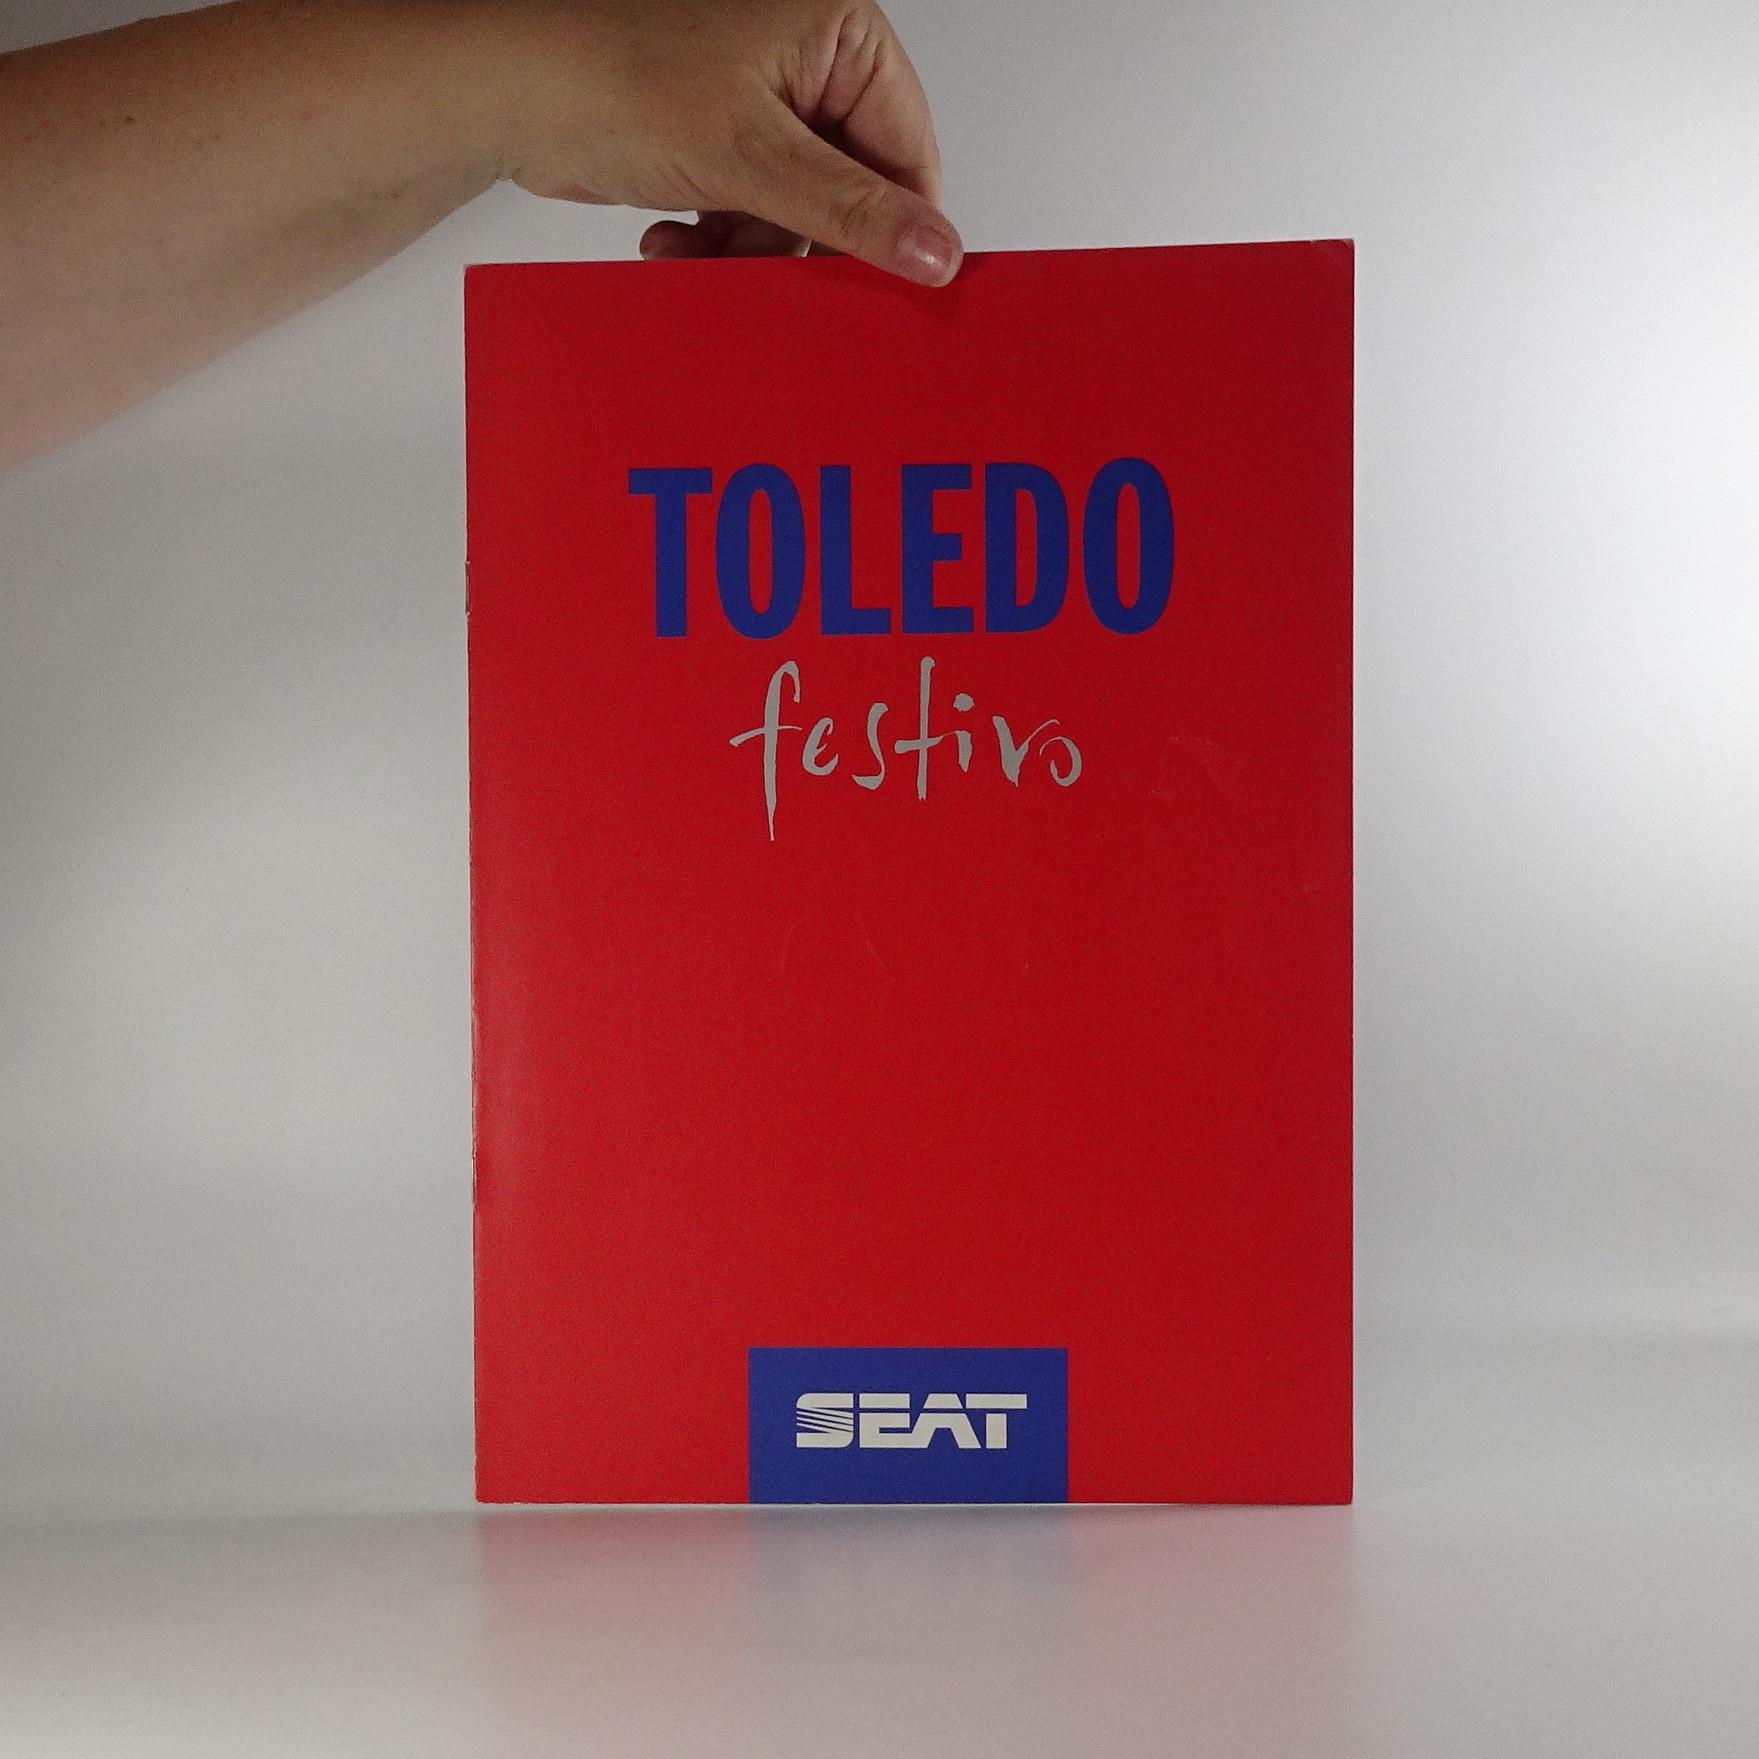 antikvární kniha Prospekt Seat Toledo Festivo, neuveden